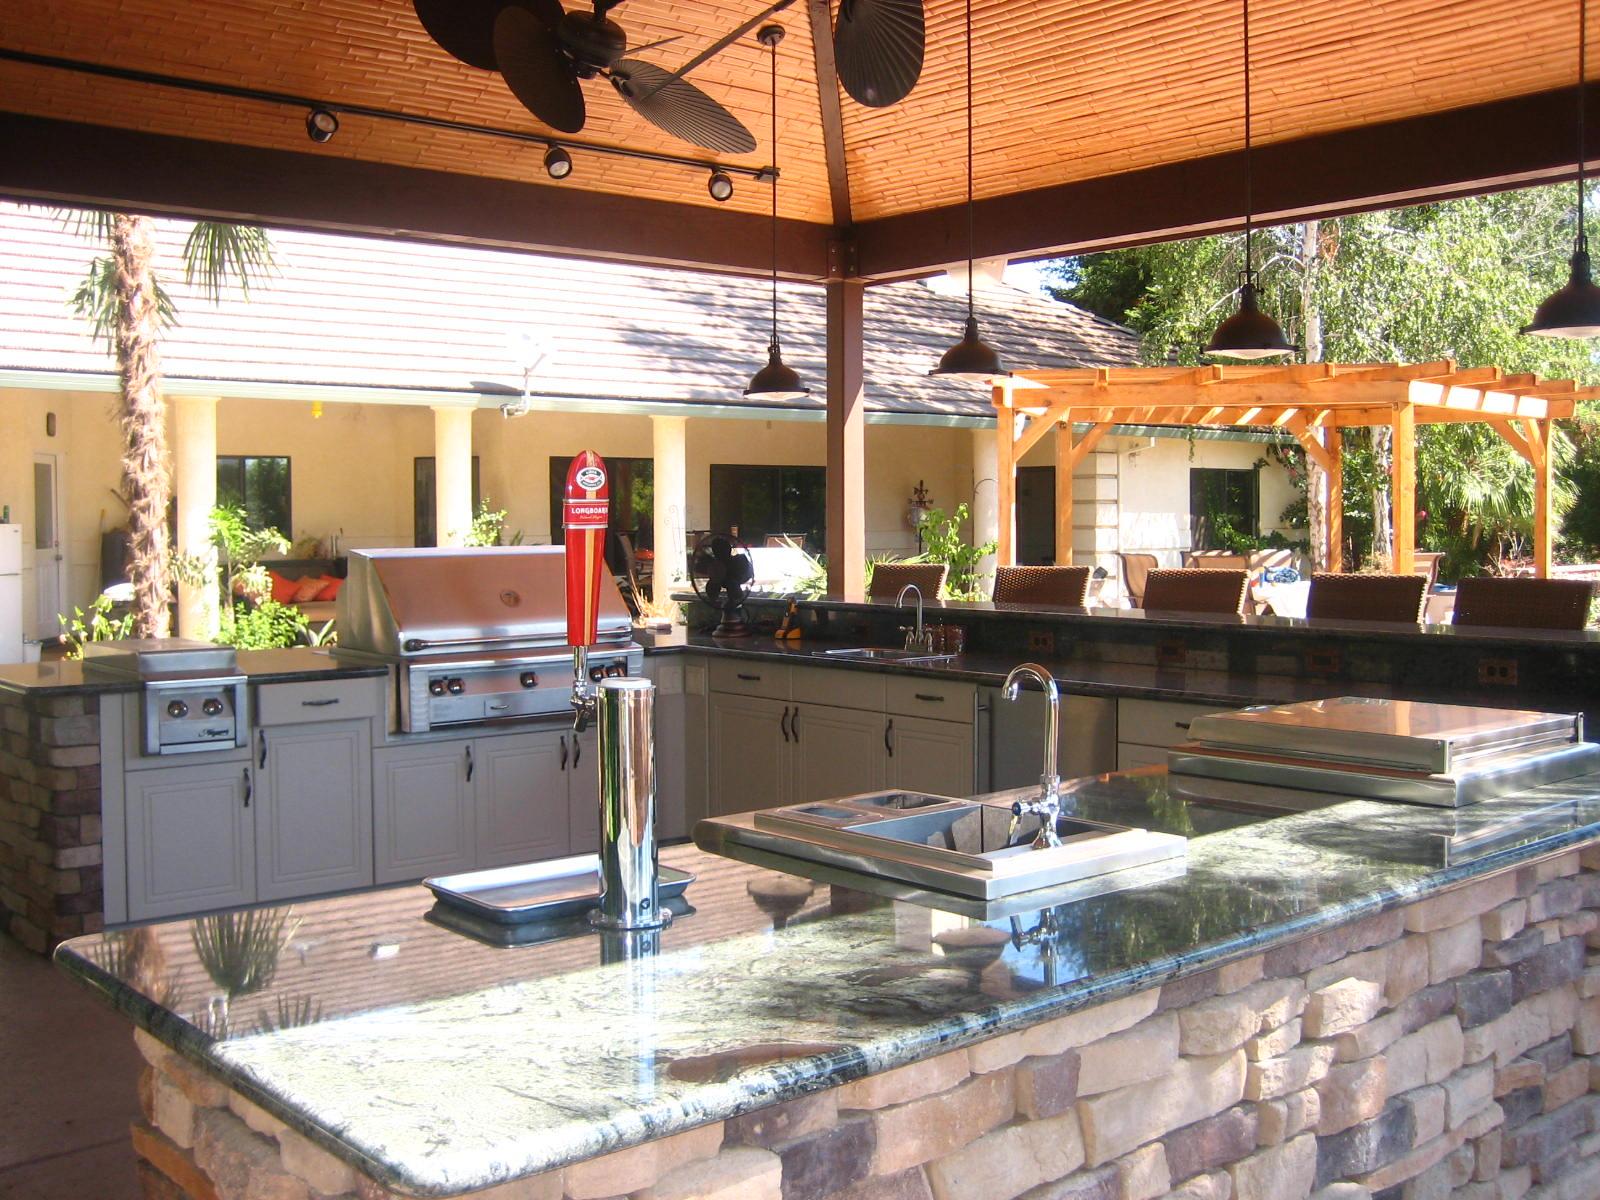 3 Design Ideas for an Outdoor Kitchen - Lanai Outdoor Kitchens on Backyard Kitchen Design id=82754